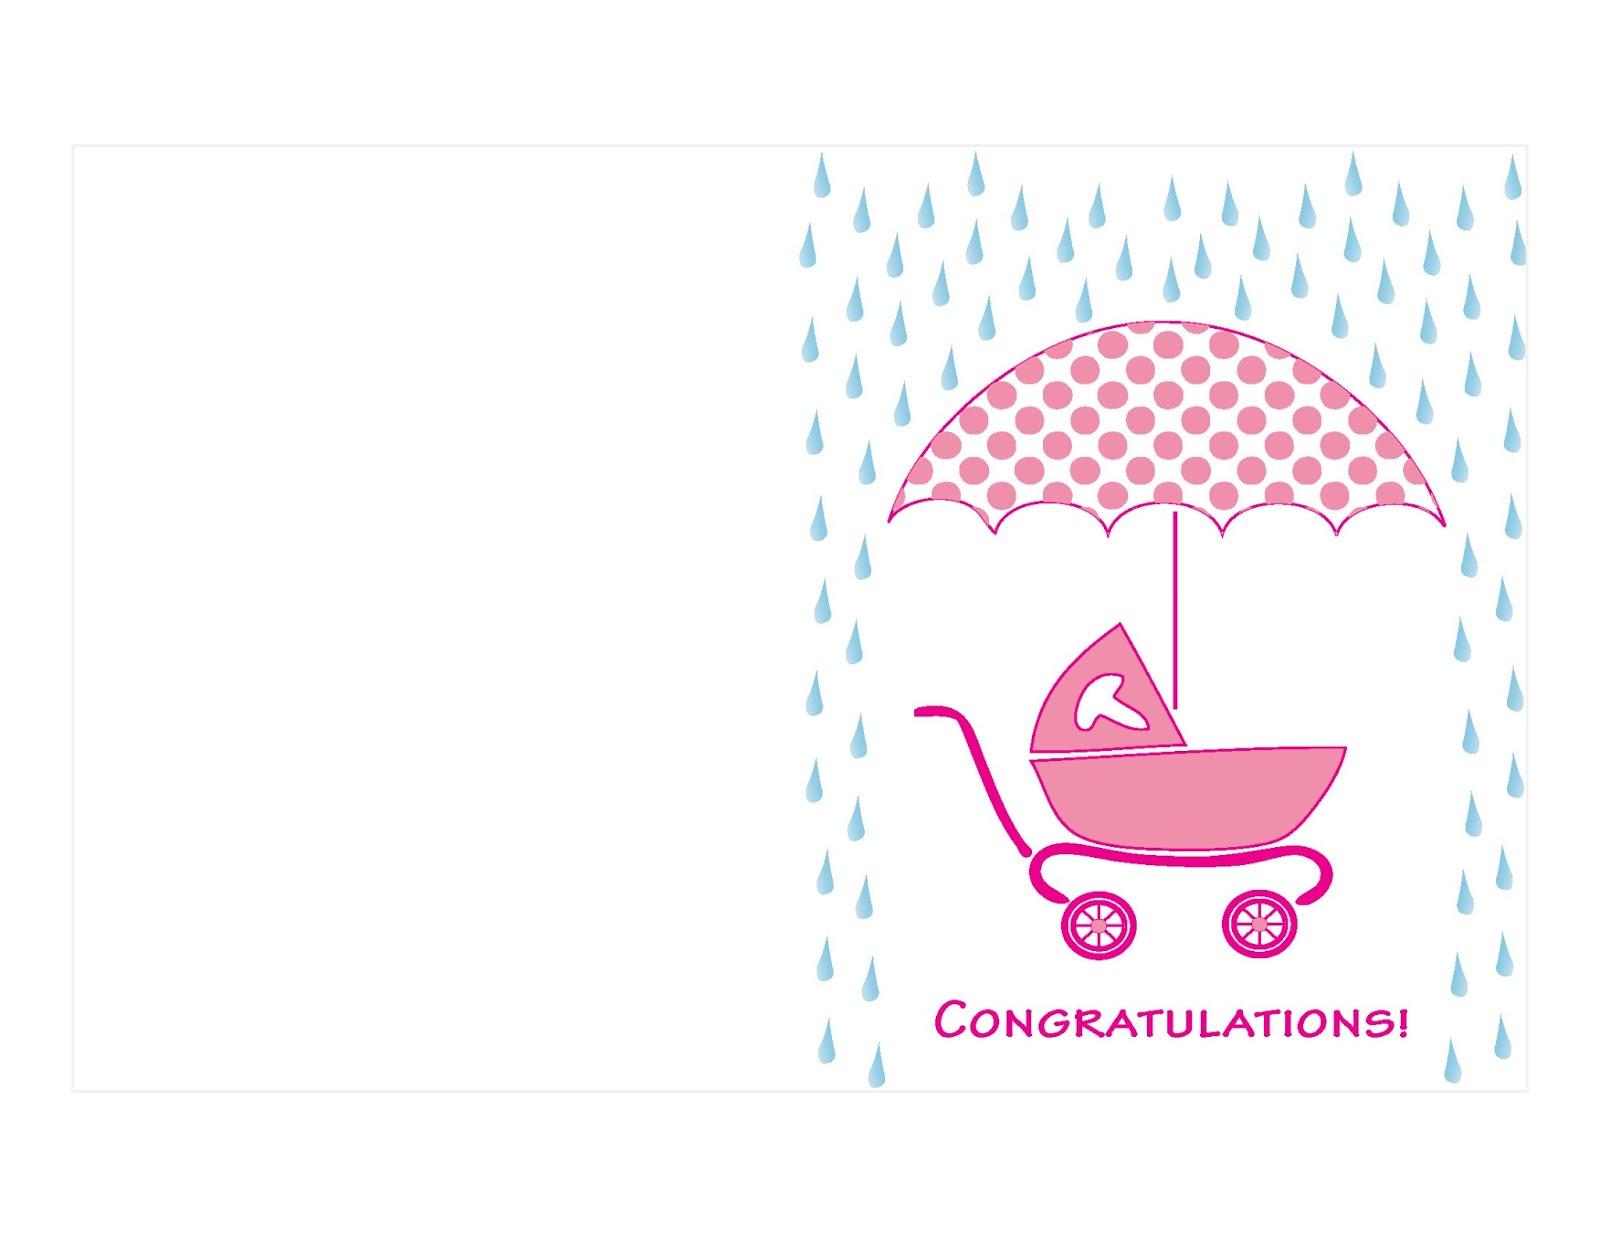 Printable Bridal Shower Card Printable Bridal Shower Advice Cards - Free Printable Bridal Shower Cards